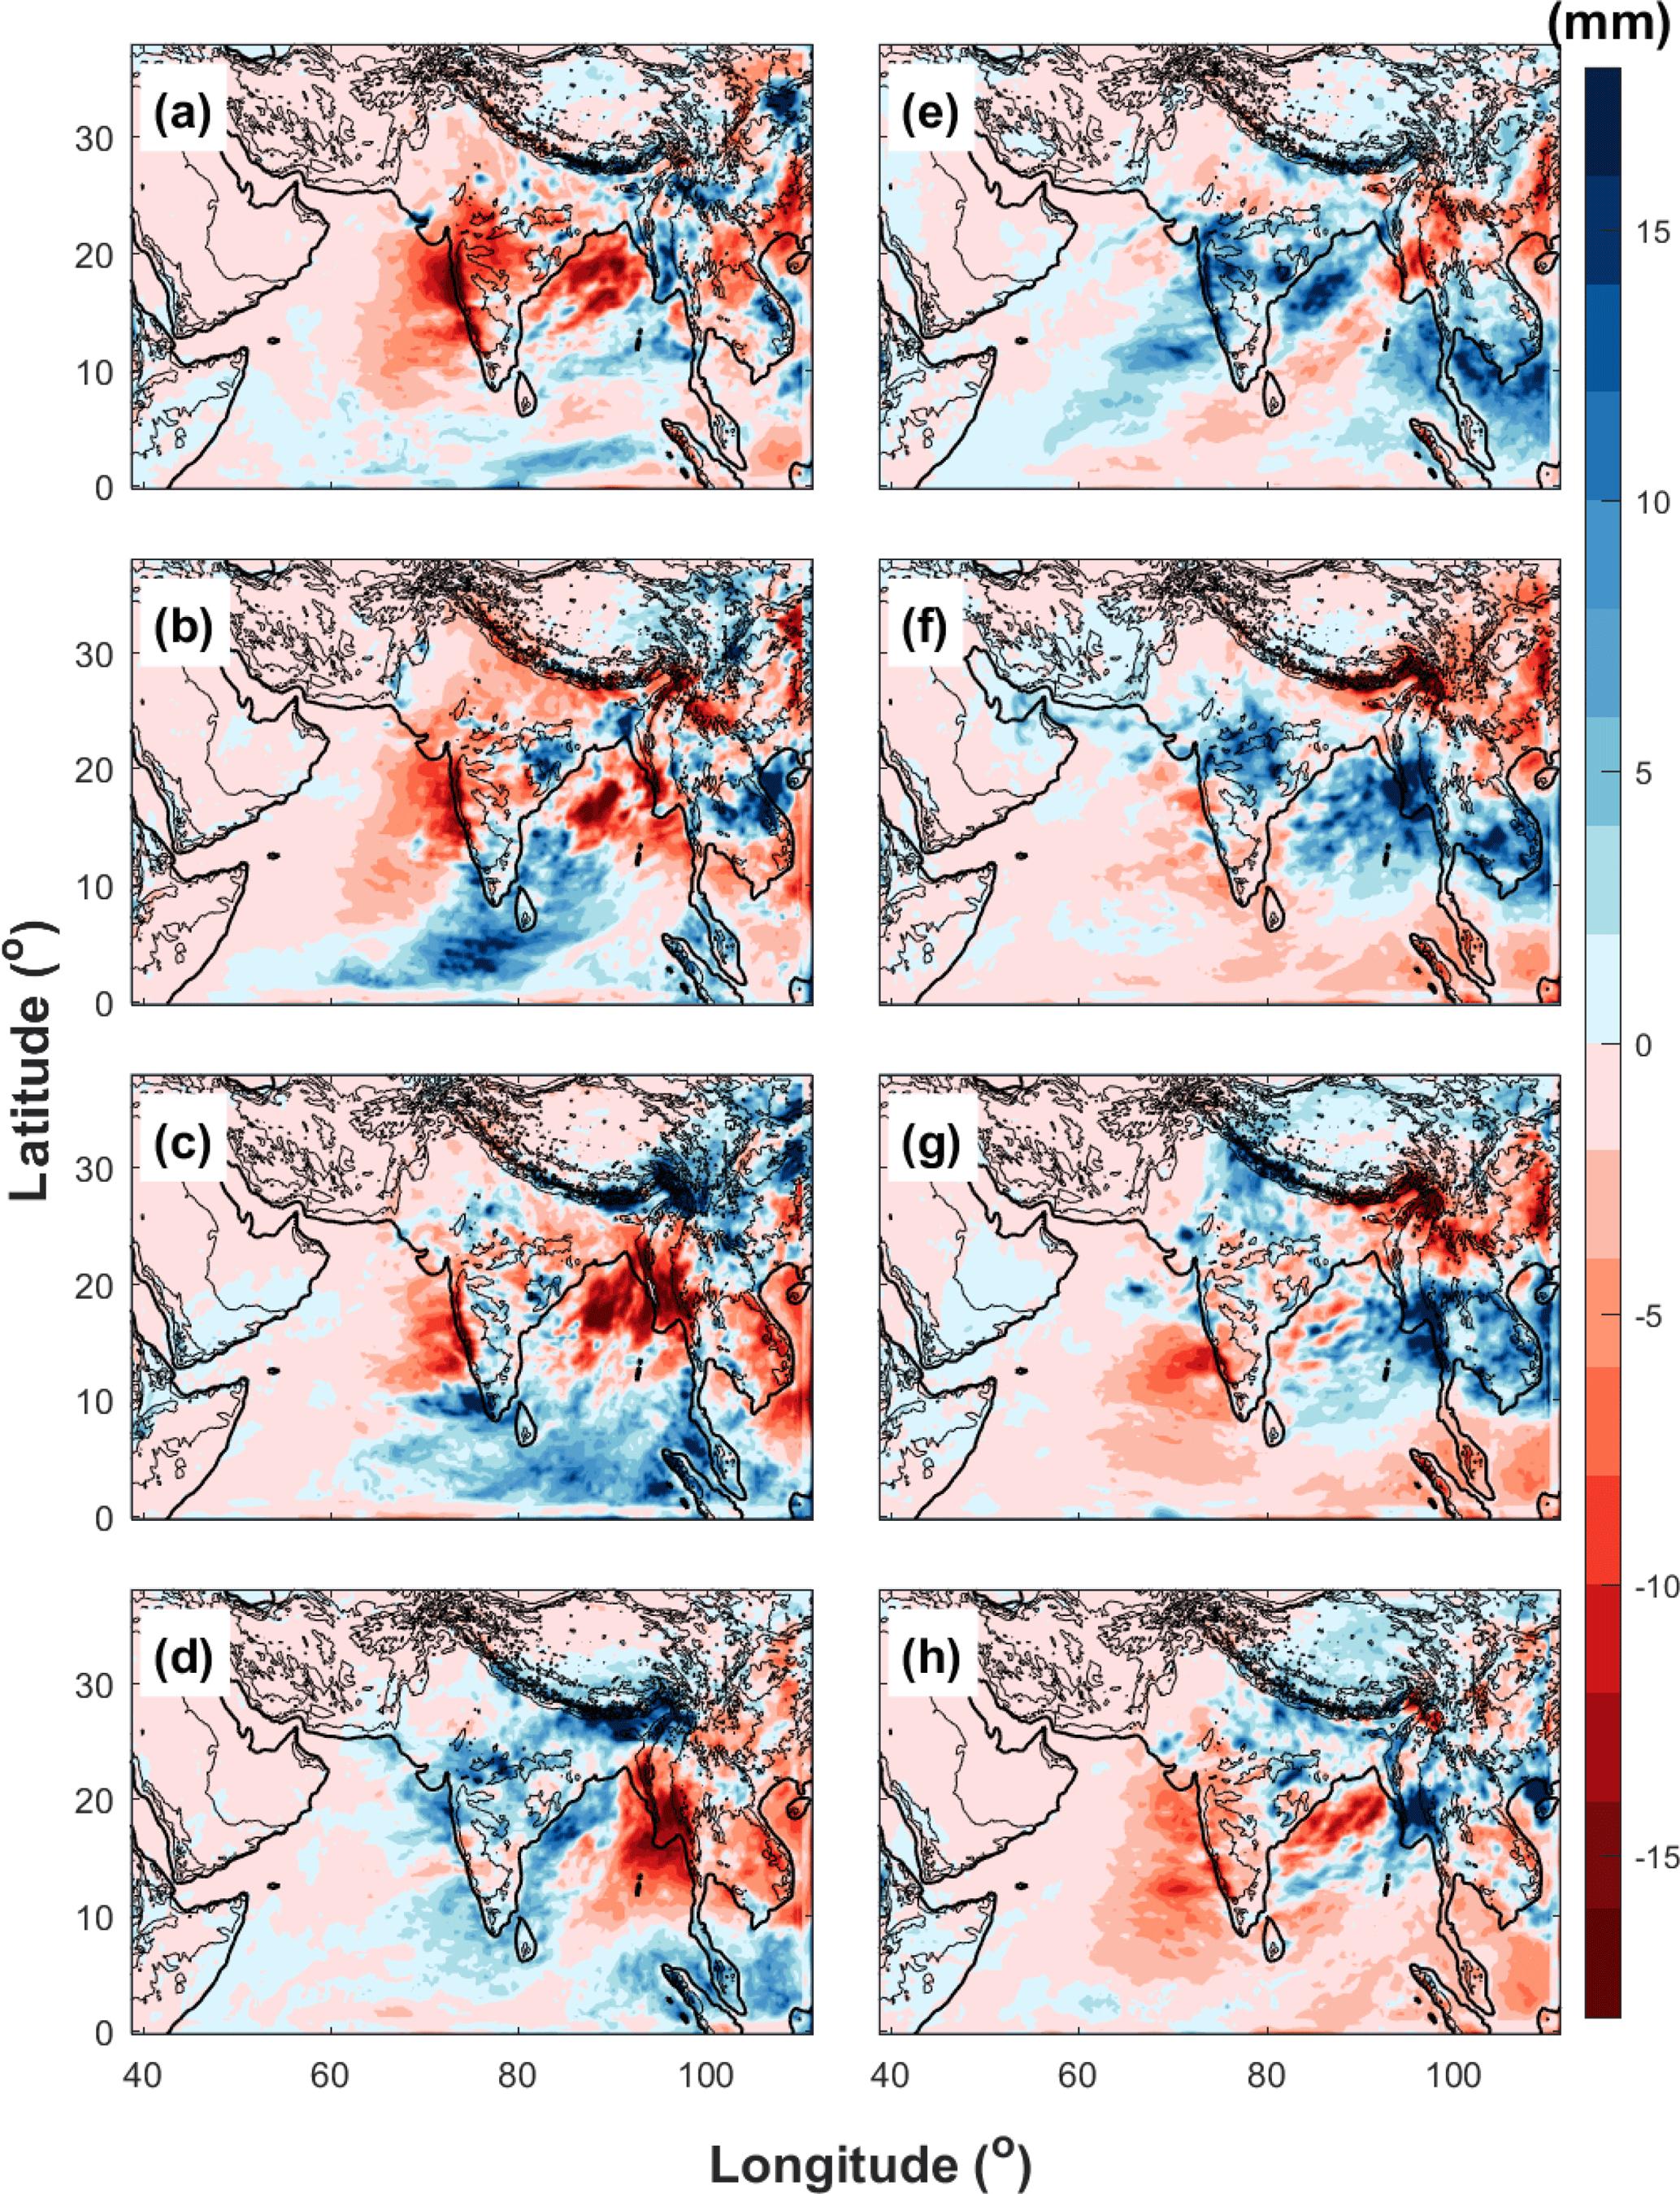 ACP - Regional simulation of Indian summer monsoon